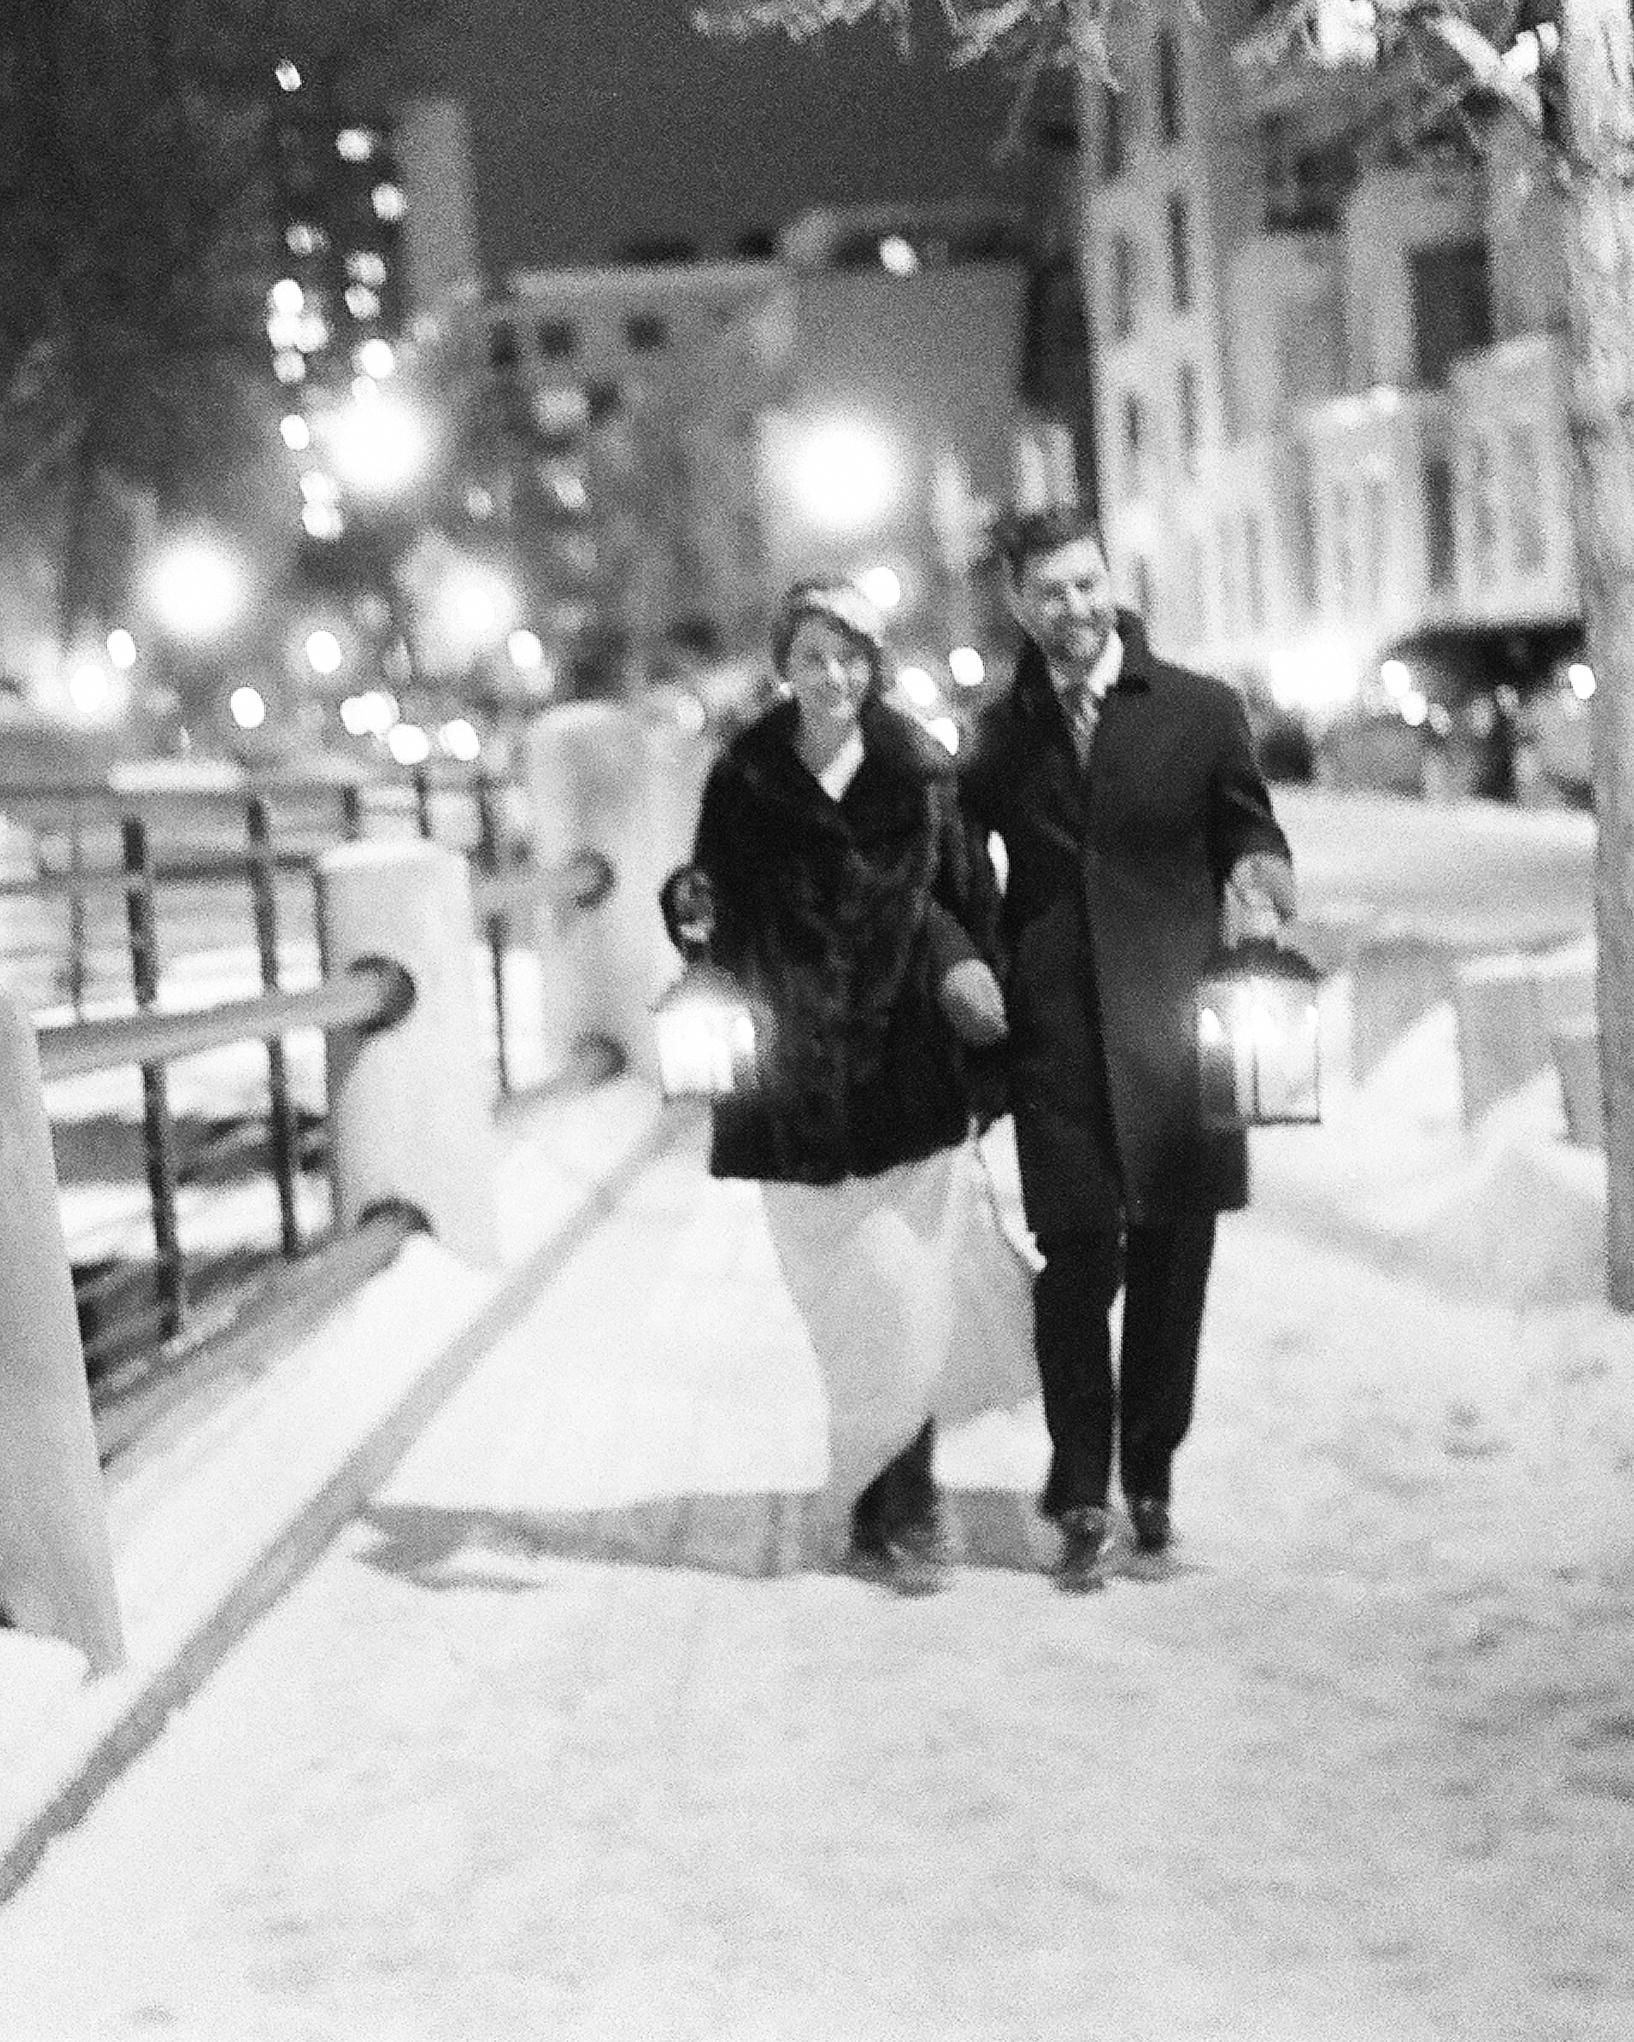 molly-sam-wedding-snow-0614.jpg